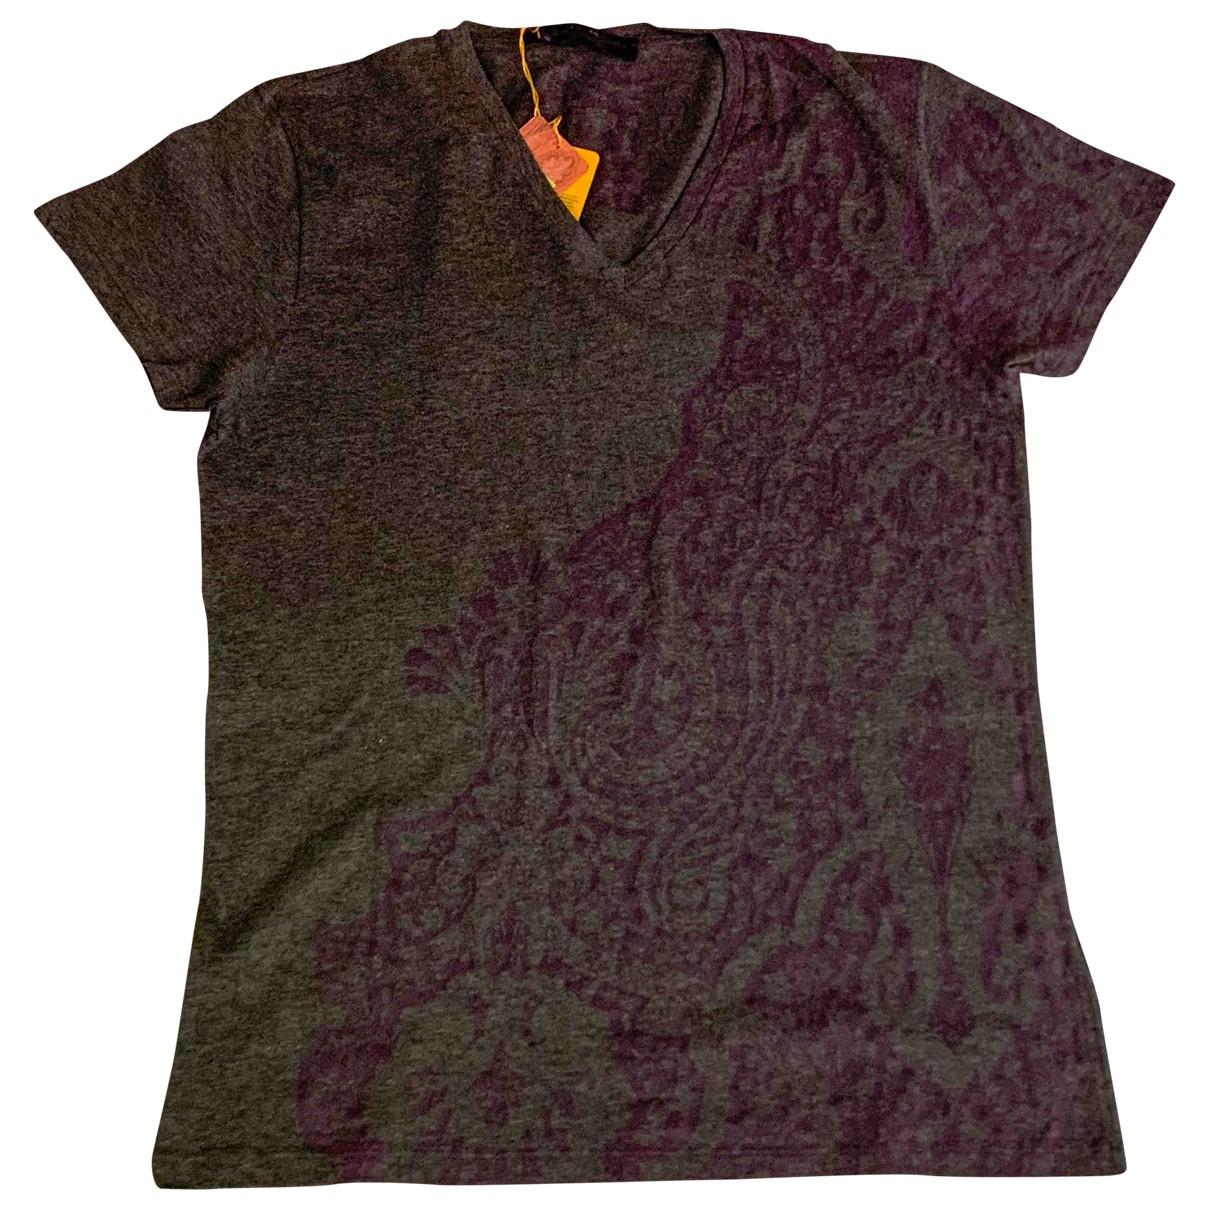 Etro \N Anthracite Cotton T-shirts for Men M International